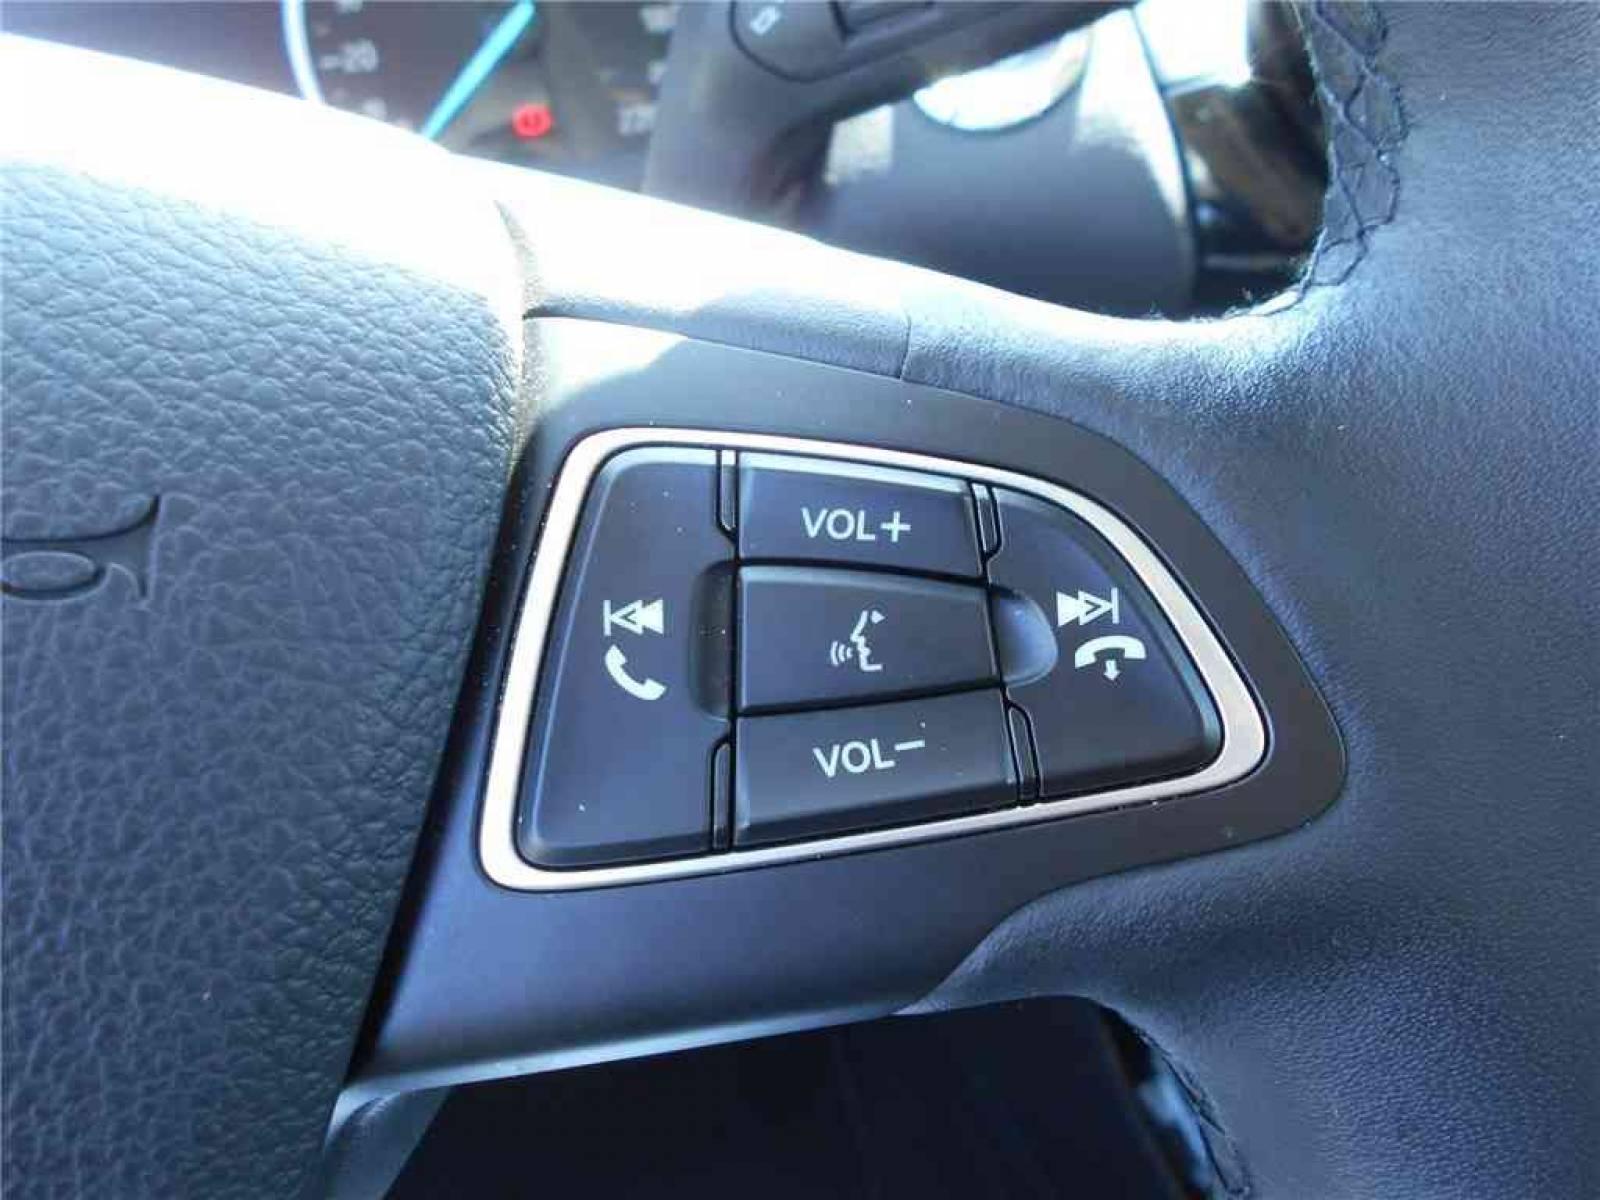 FORD EcoSport 1.0 EcoBoost 125 BVM6 - véhicule d'occasion - Groupe Guillet - Chalon Automobiles - 71100 - Chalon-sur-Saône - 17